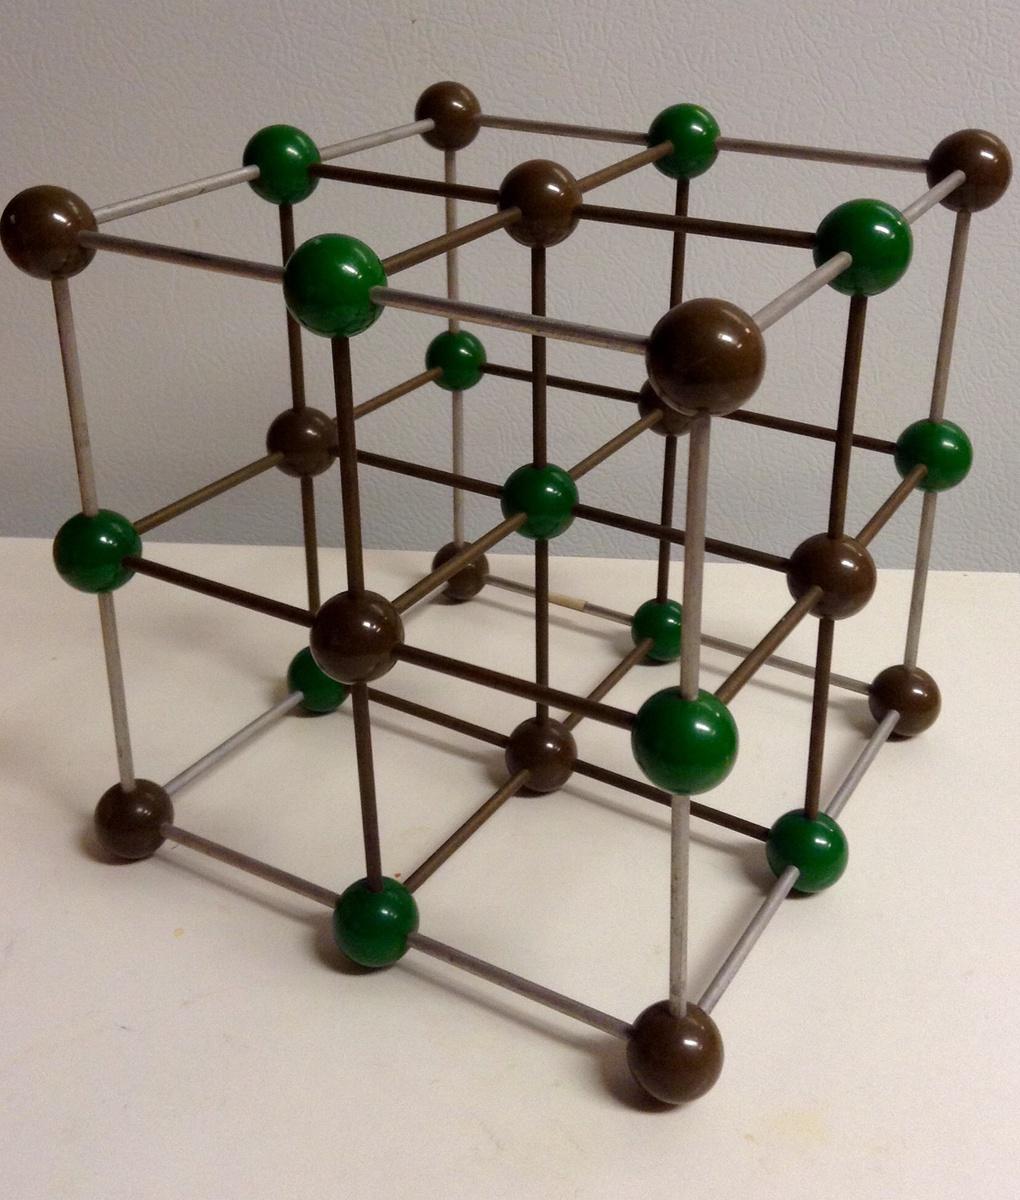 Sodium Chloride (Metaloglass)